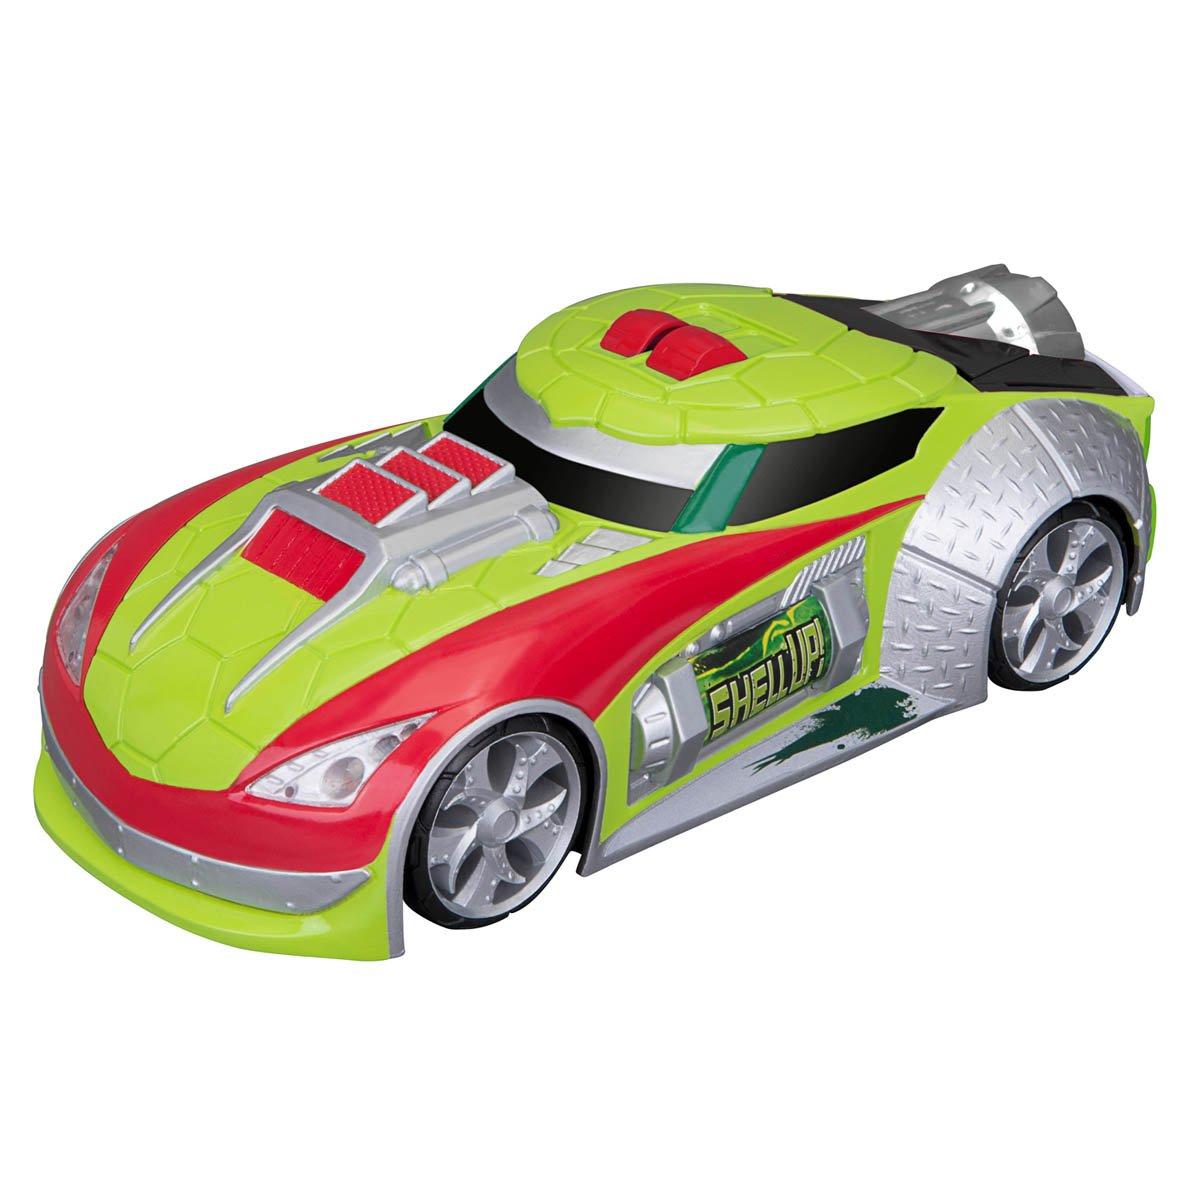 Teenage Mutant Ninja Turtles 9049 Raph 's schlammwesen Booster Spielzeug